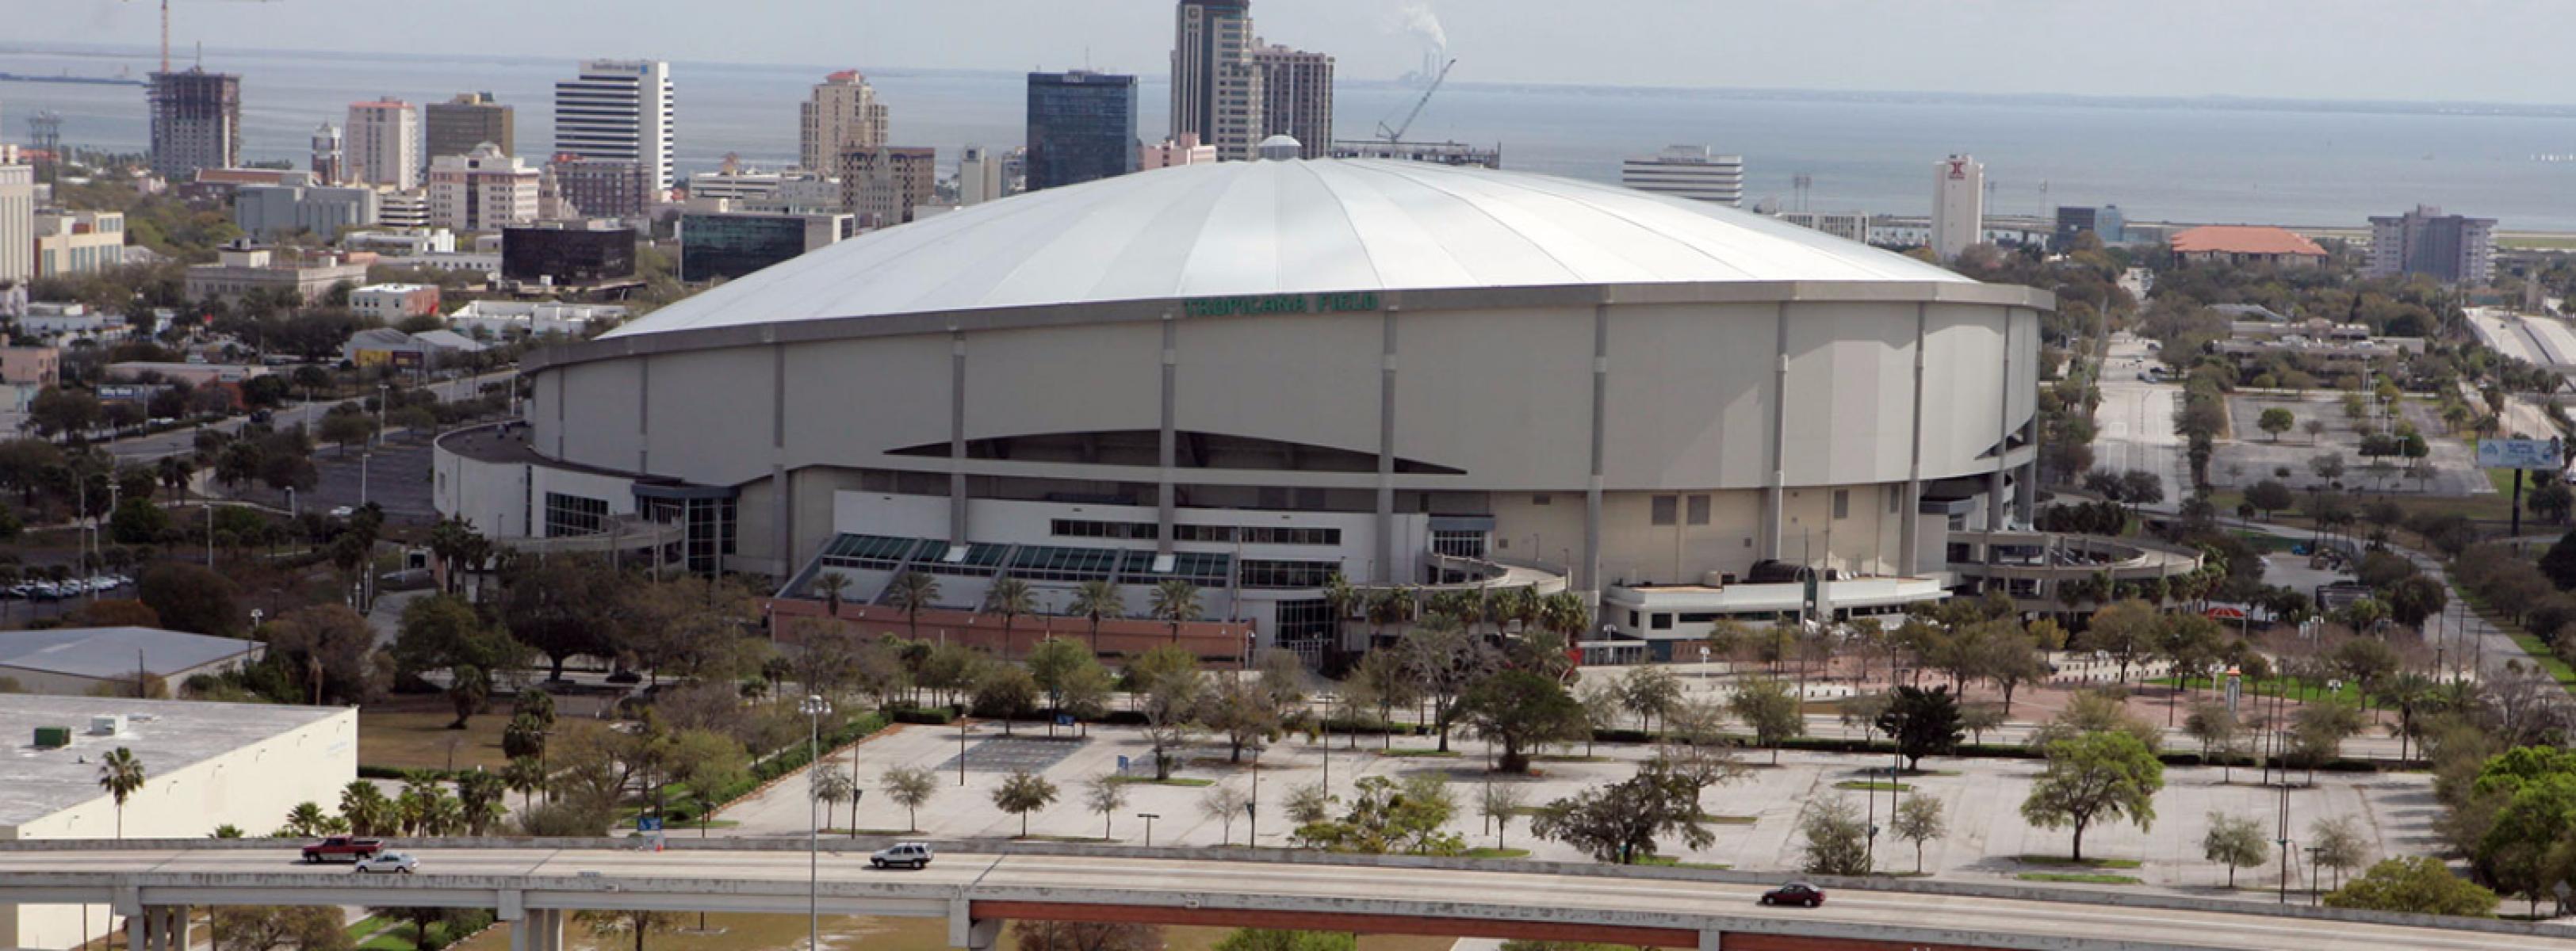 2016 st petersburg bowl mississippi state vs miami oh